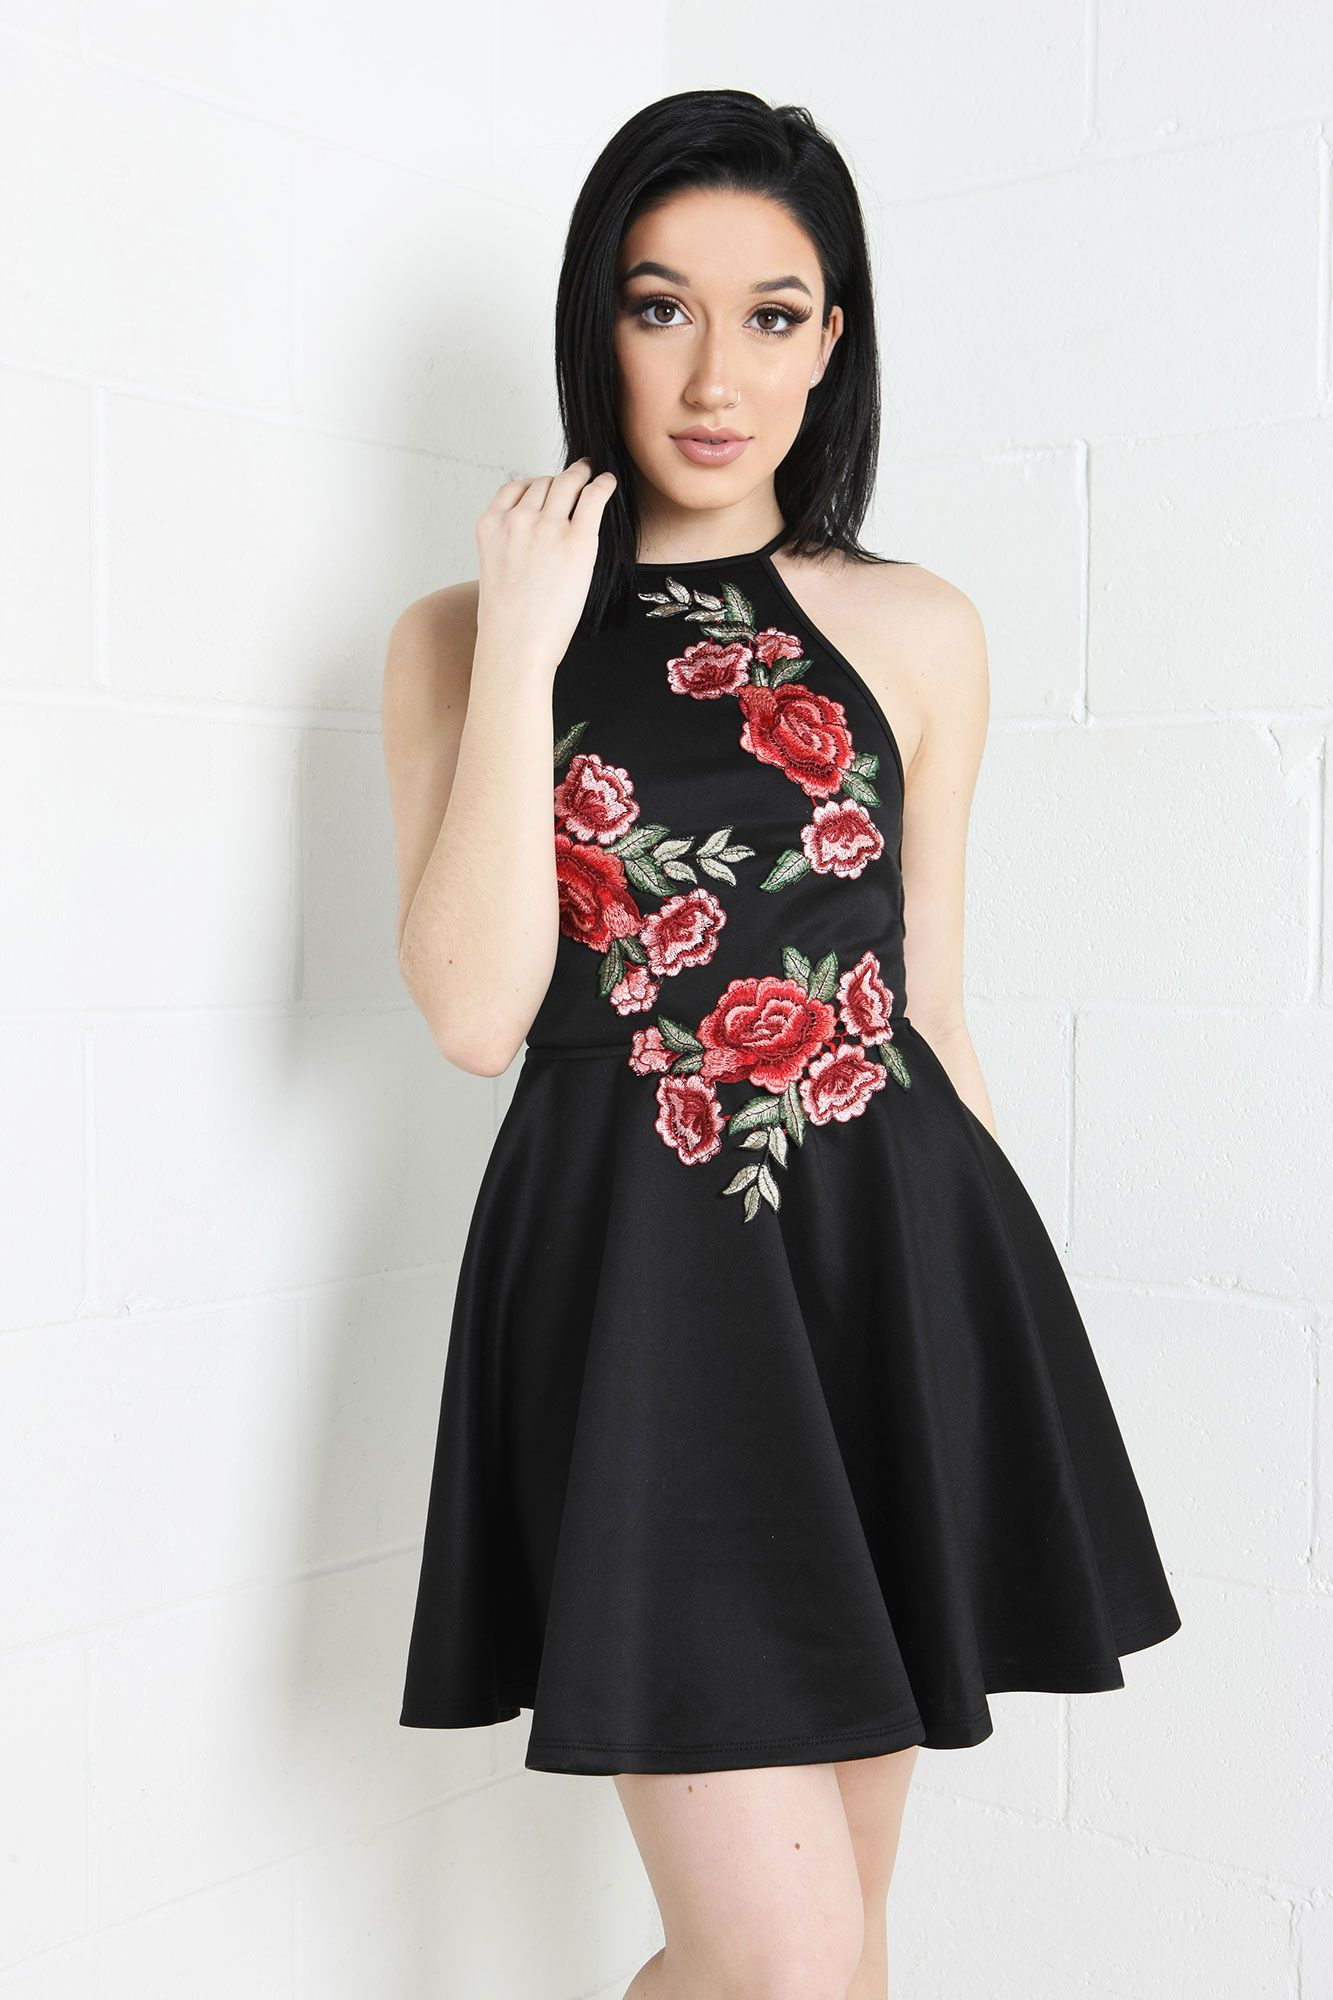 Black dress urban planet - Urban Planet Com Media Catalog Product 0 9 093043438911_black_0jpg_1 Jpg